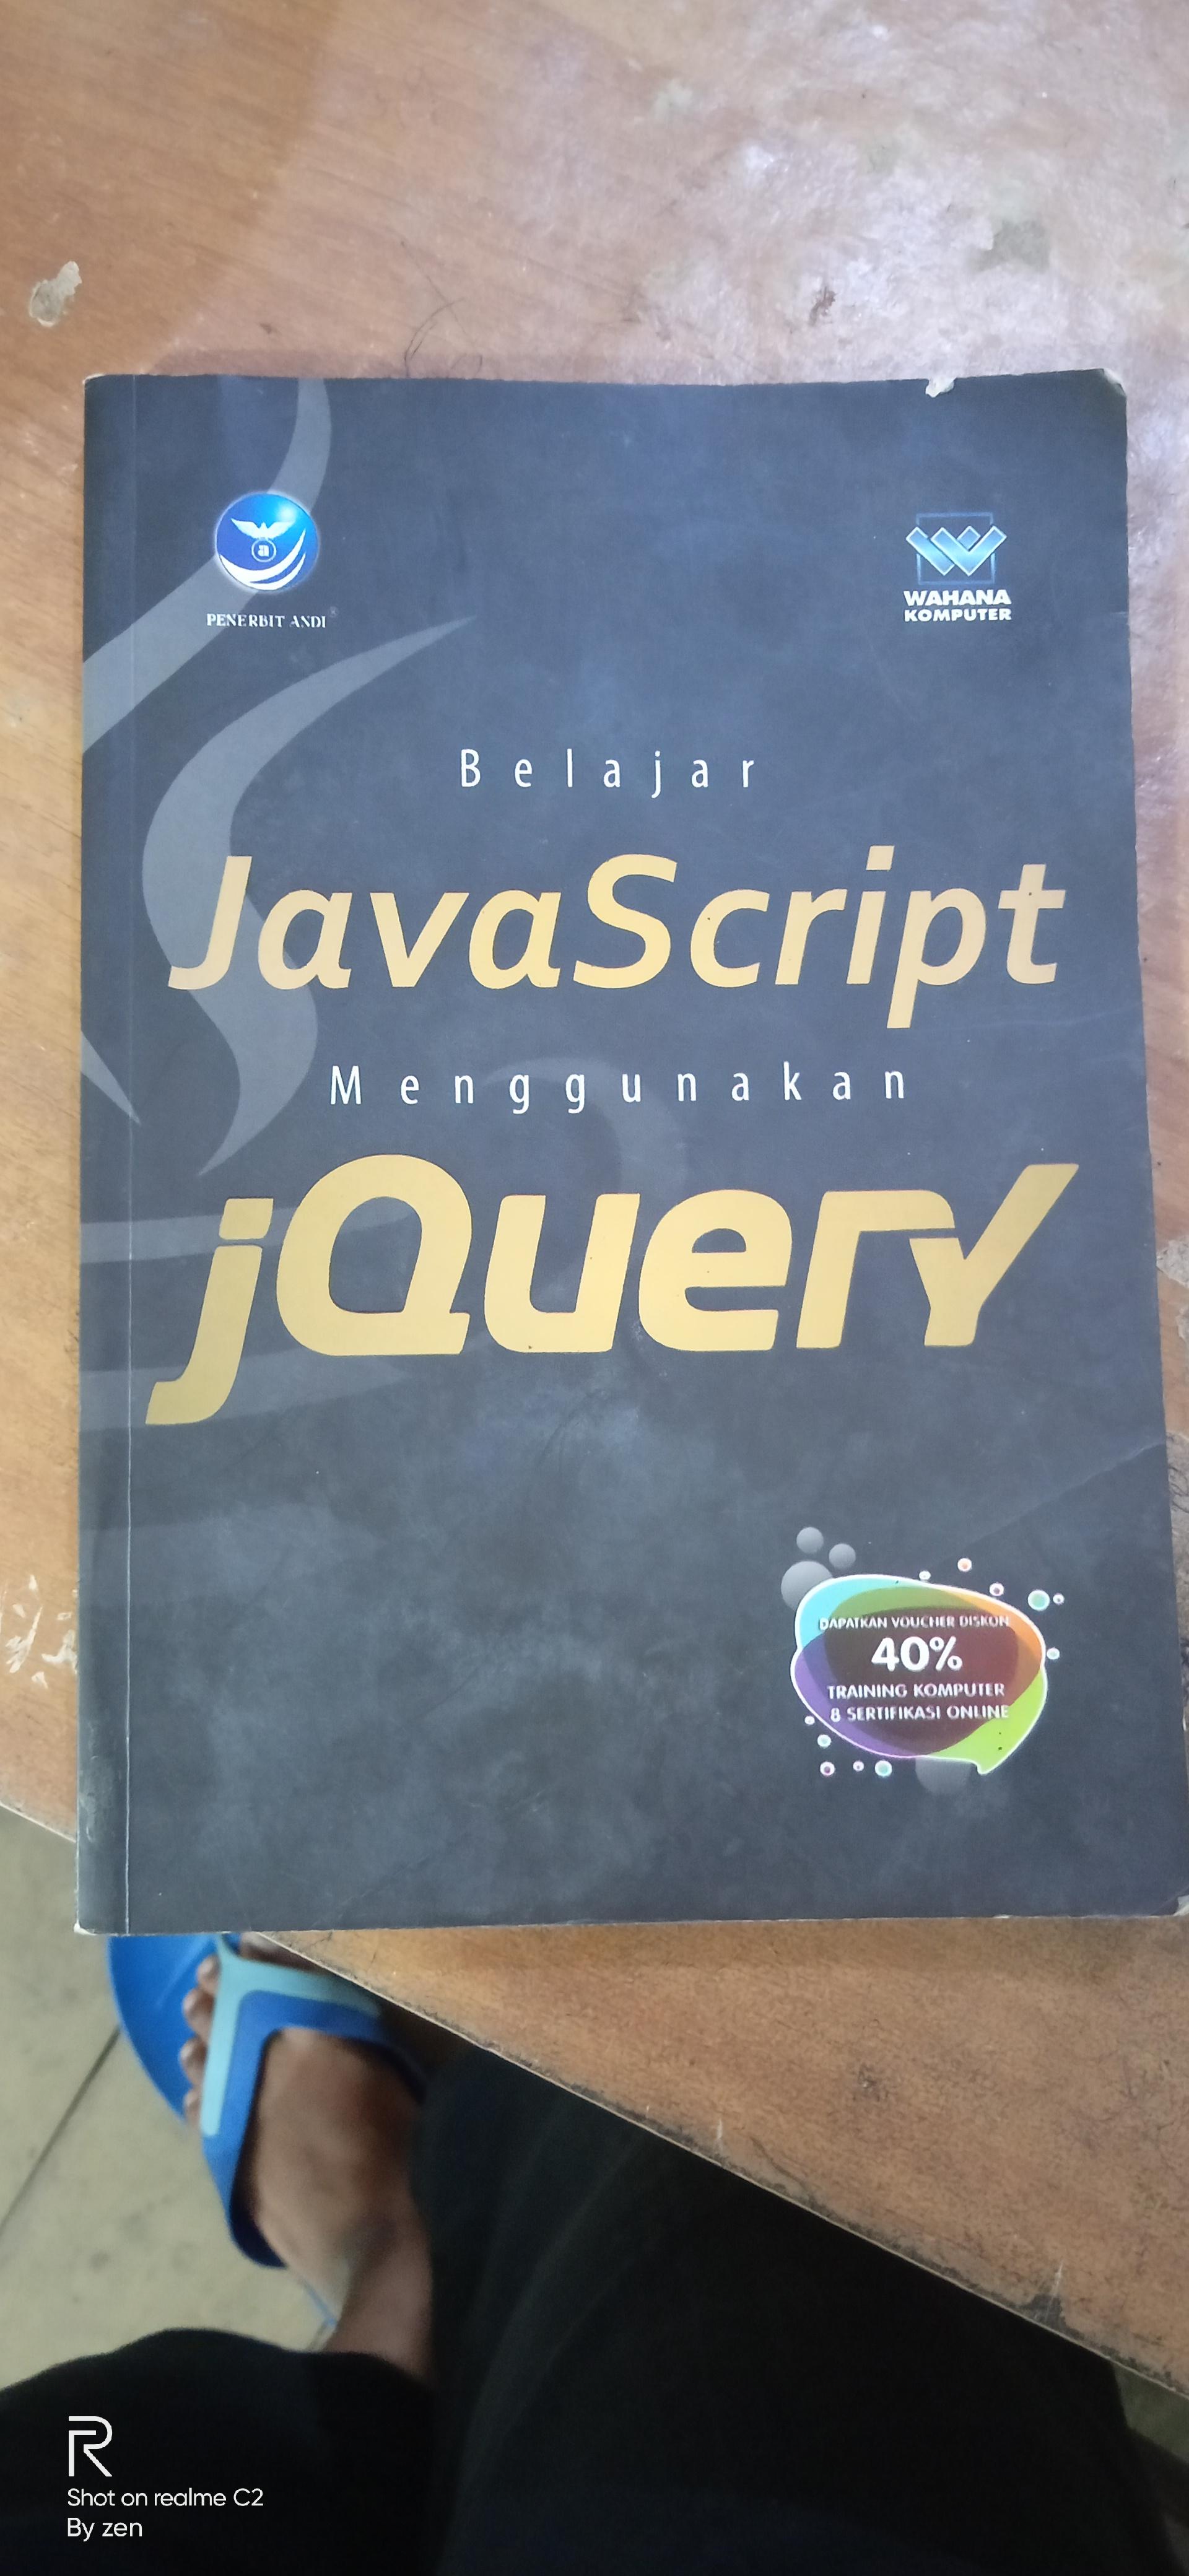 Belajar Javascript Menggunakan Jquery